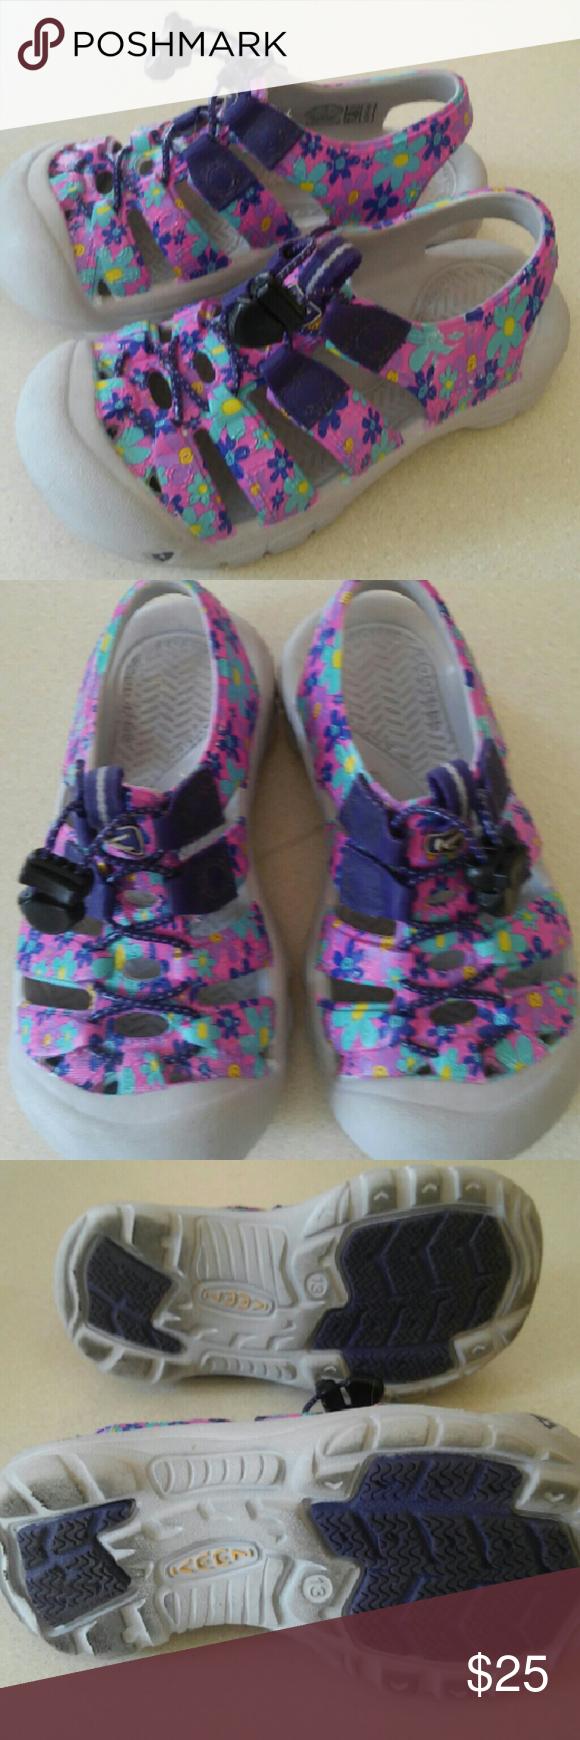 Girl's Keen Sandals Keen sandals. Great condition Keen Shoes Sandals & Flip Flops